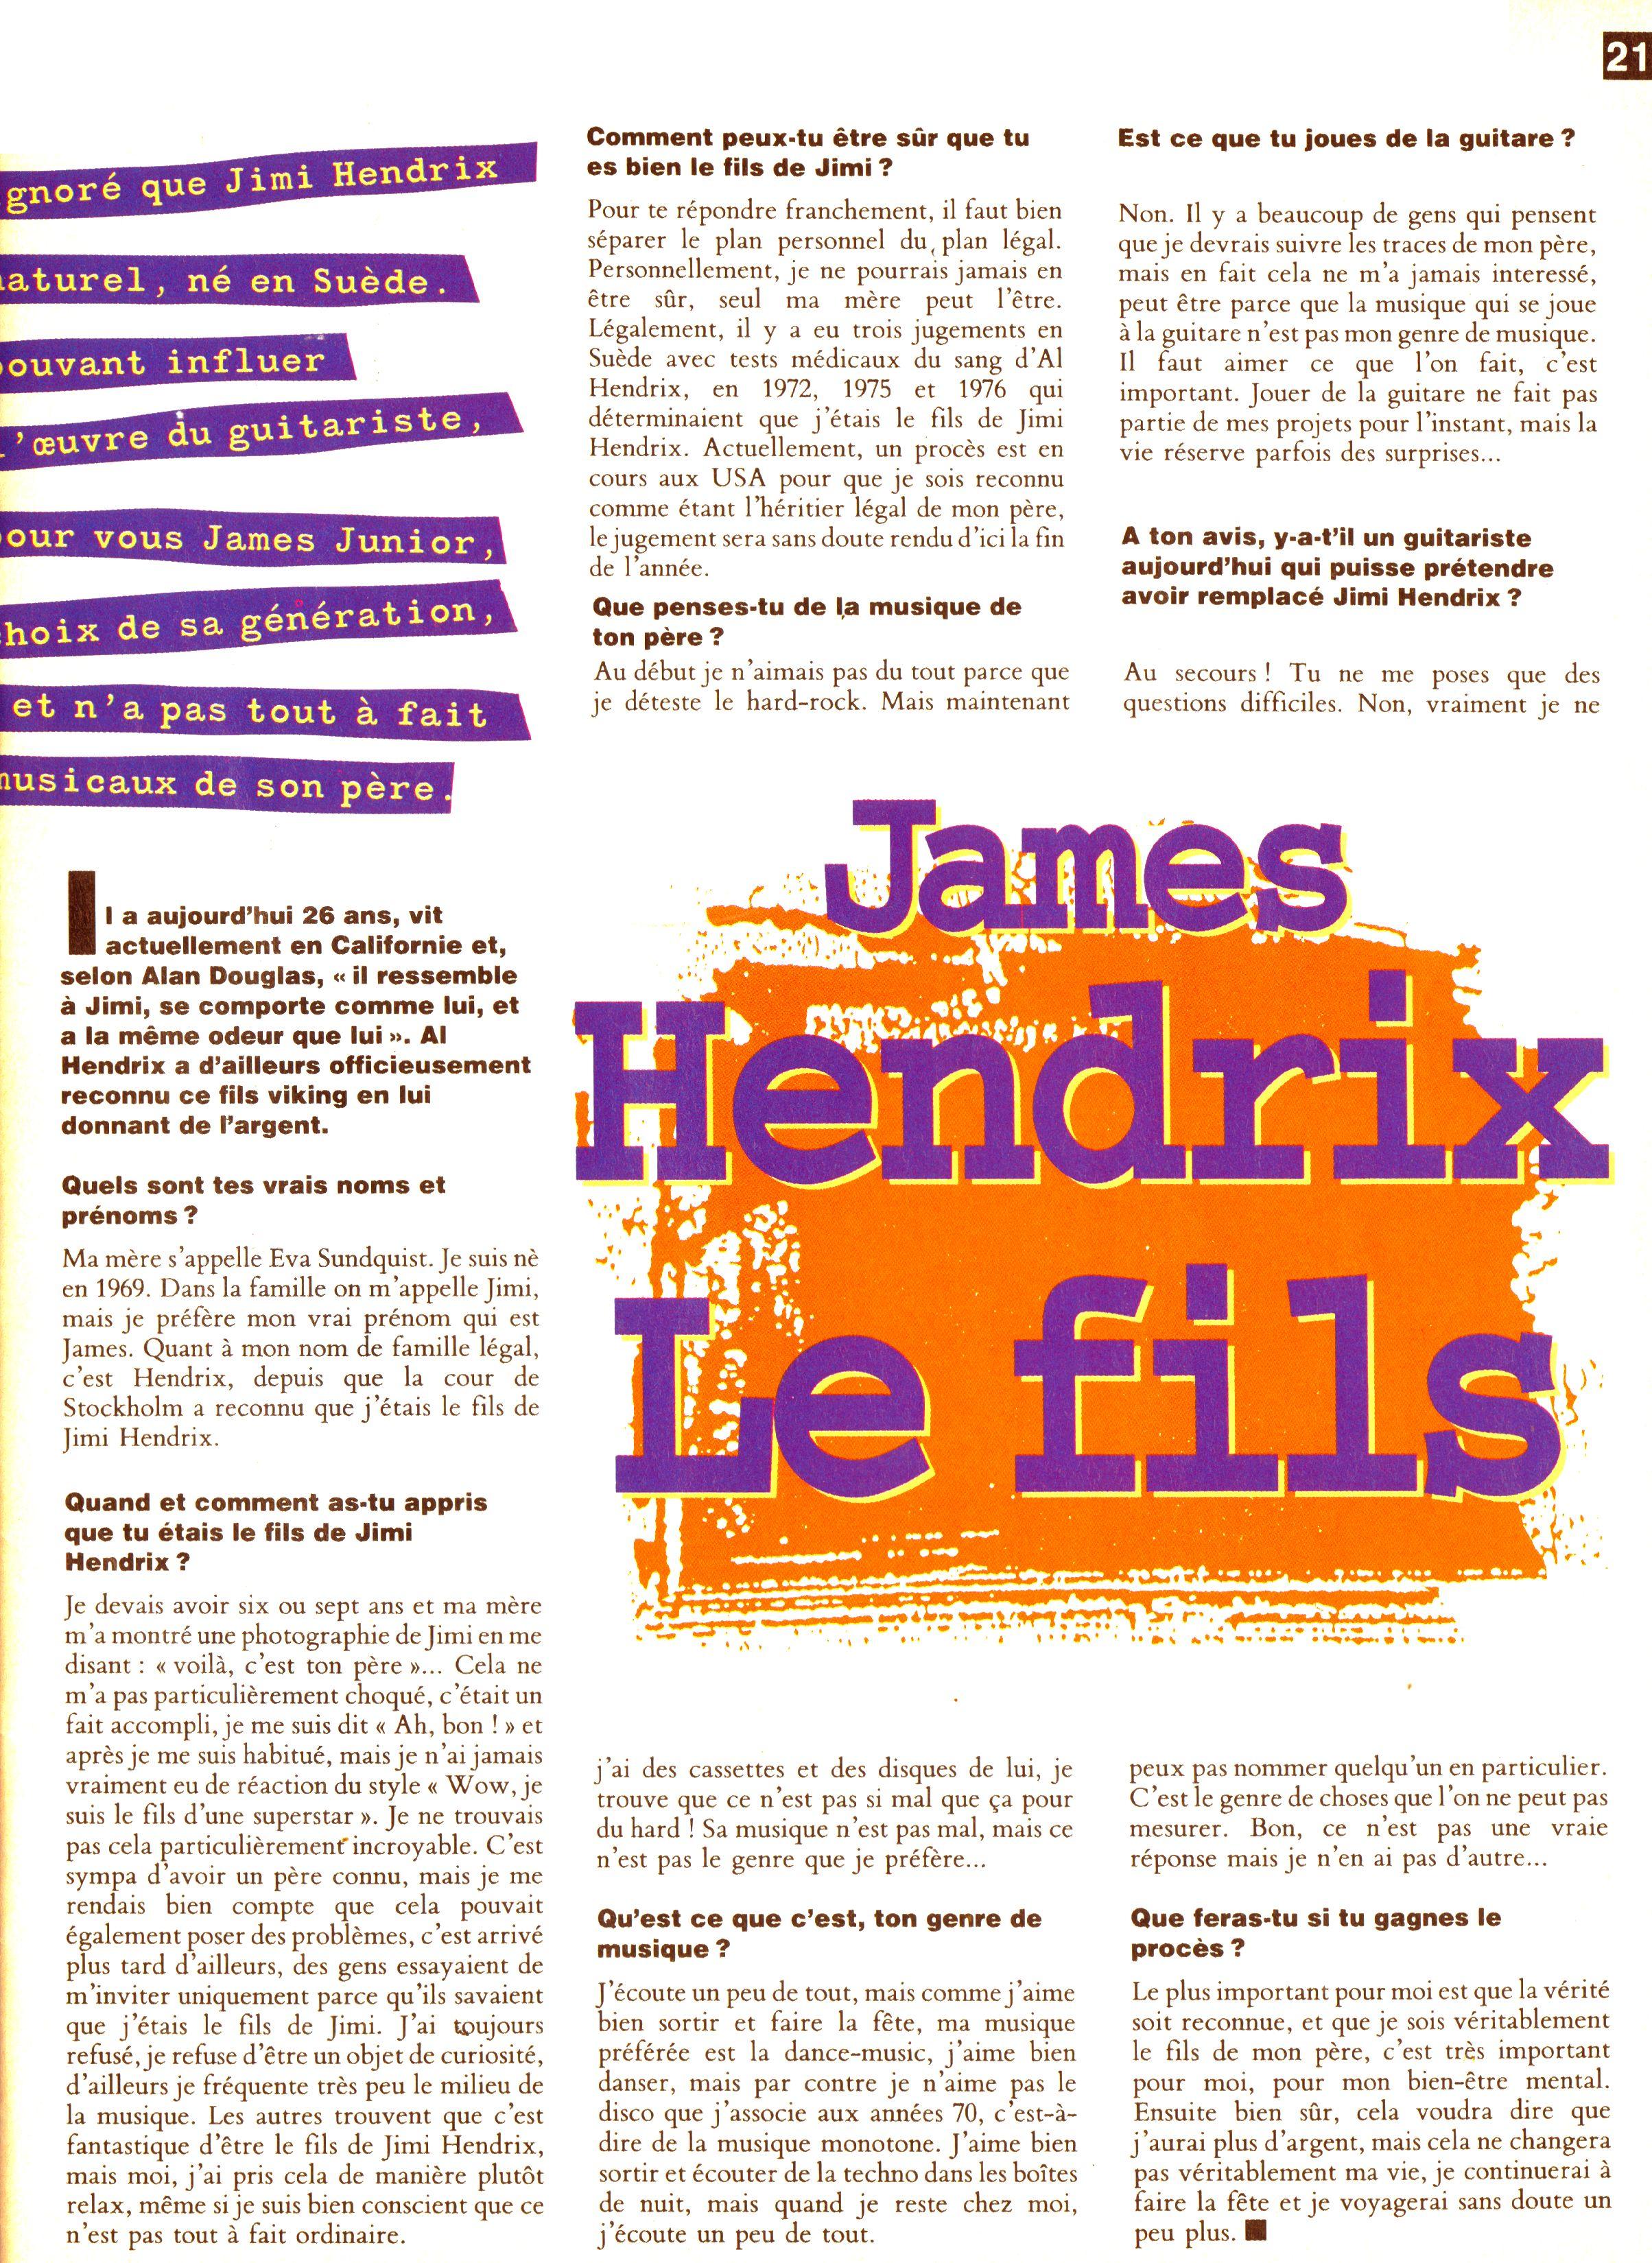 Magazines Français 1989 - 2014 GuitaristMai1995Page21